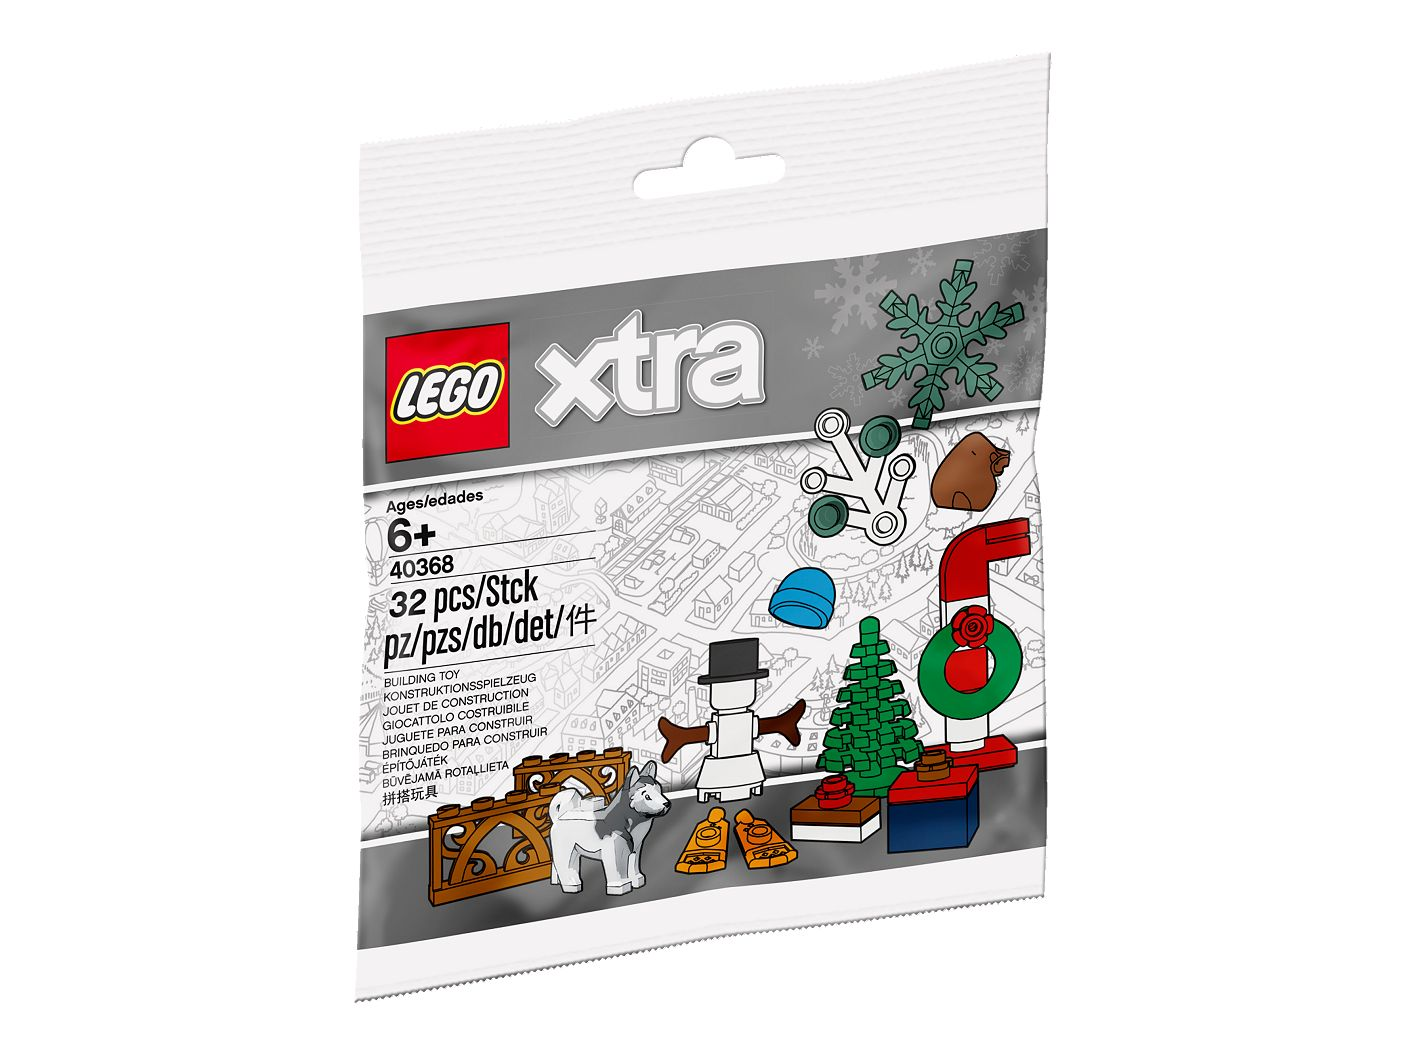 LEGO® xtra Xmas Accessories